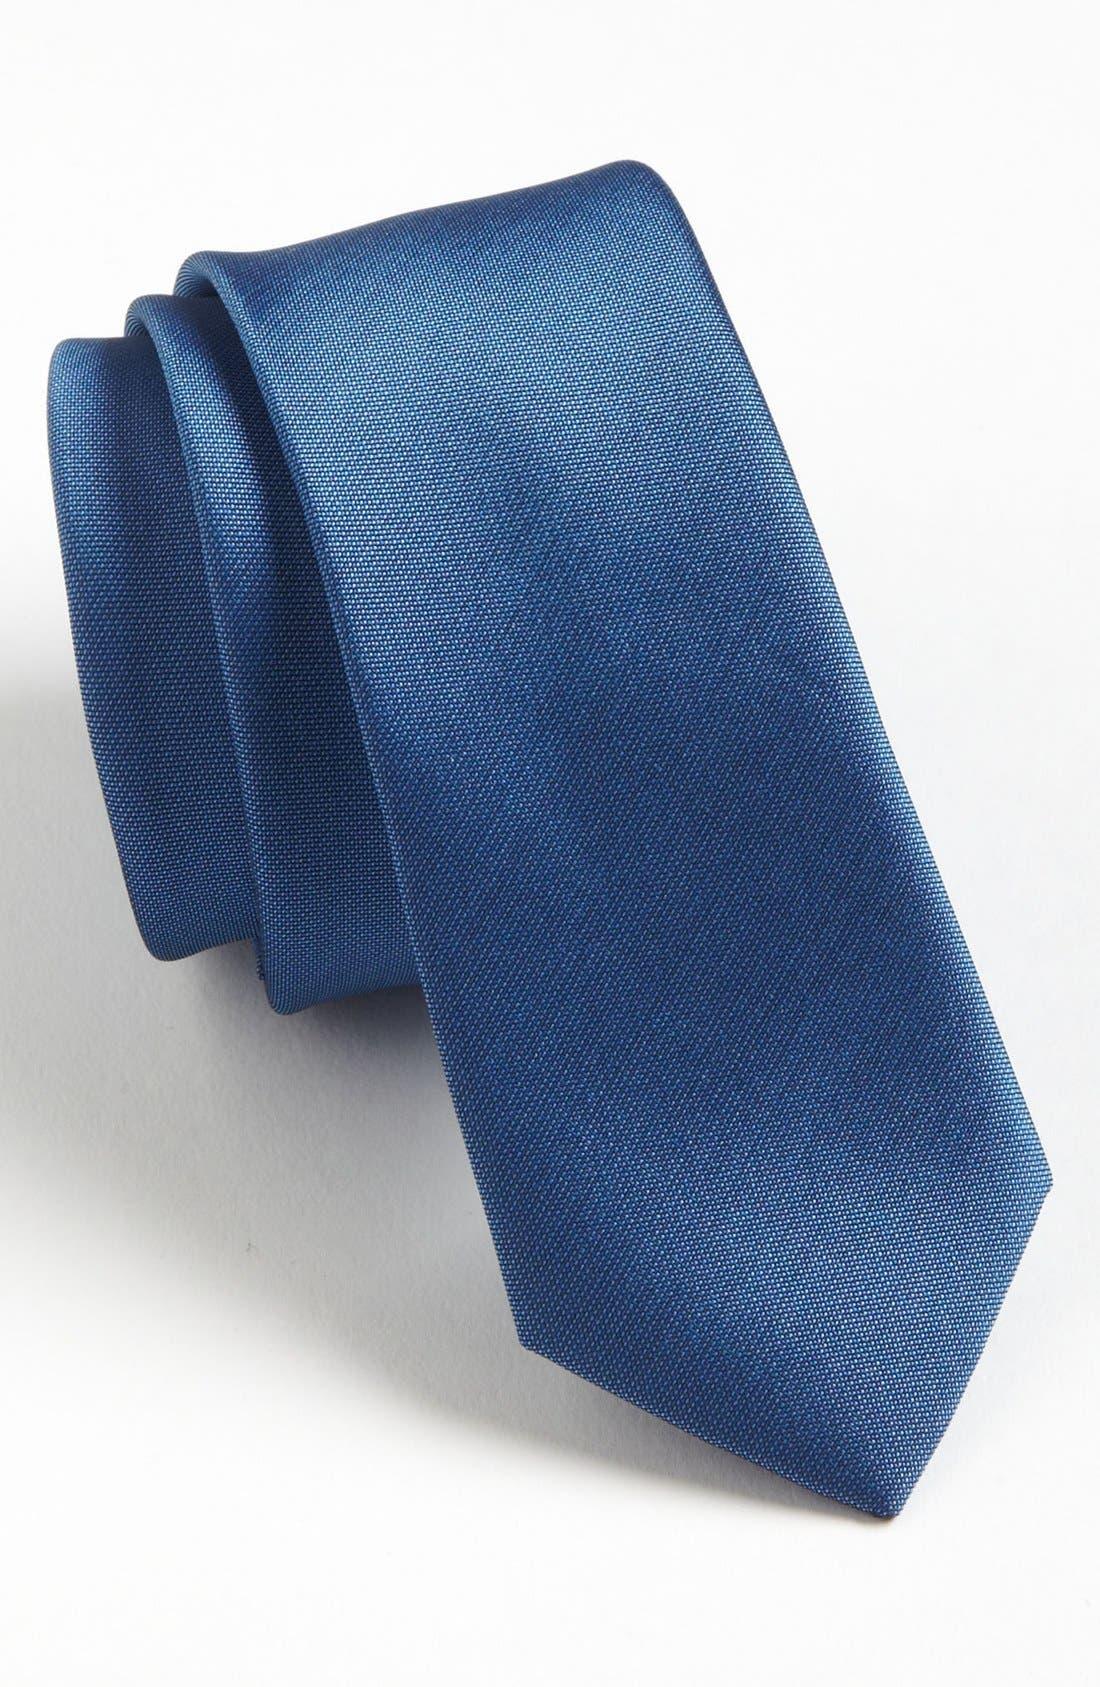 Alternate Image 1 Selected - Topman 'Spring' Skinnny Woven Tie